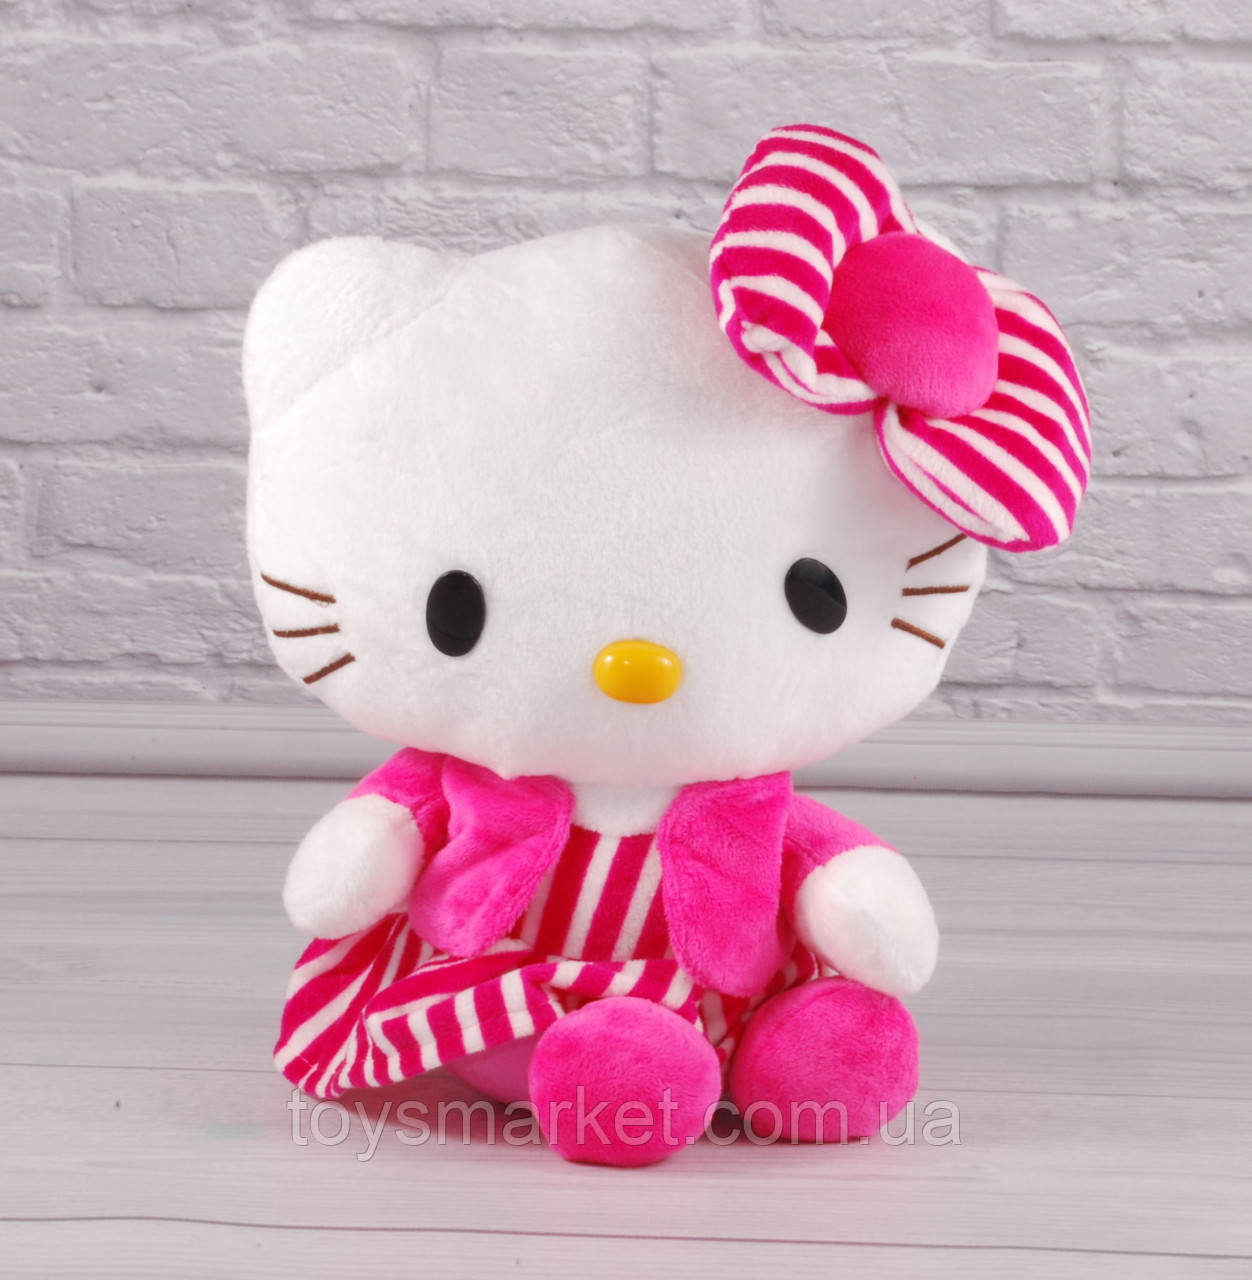 "Мягкая игрушка Китти, Хелло Китти, ""Hello Kitty"", плюшевый кот"